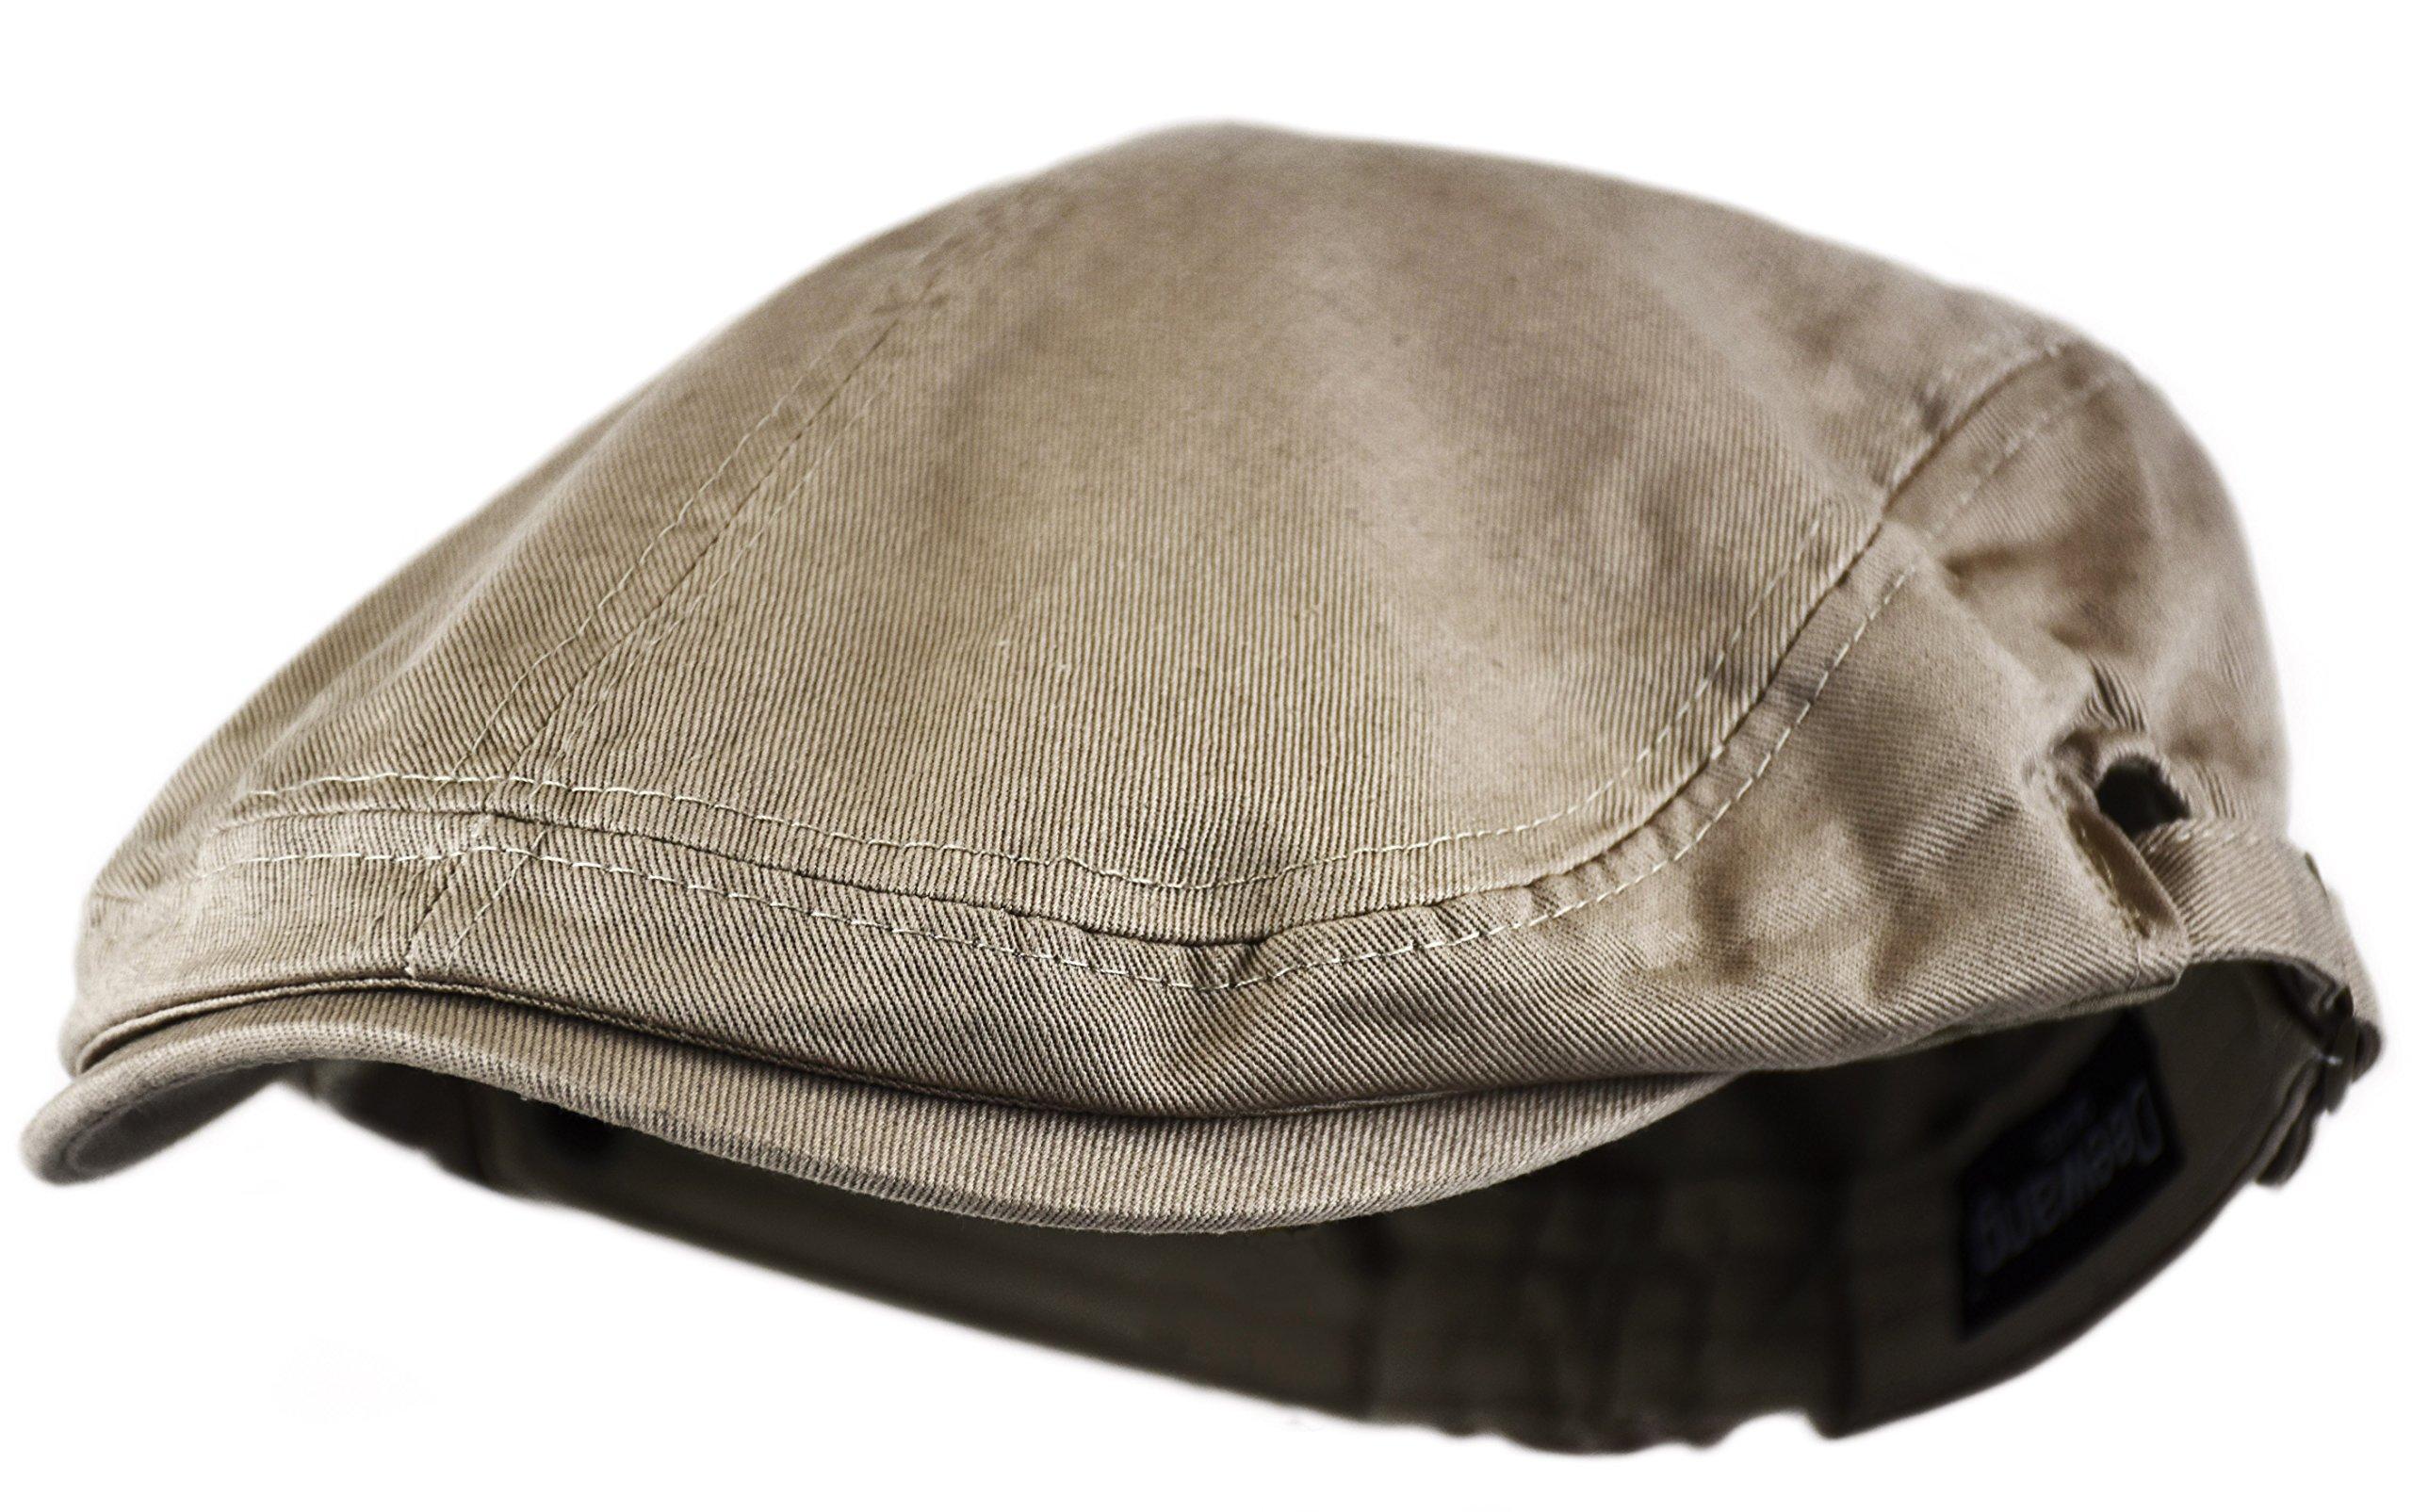 961efb33b40 Deewang Fashion Cotton Cabbie Hat Buckle Golf Ivy Colorful Newsboy Driving  Cap (Khaki) Apparel